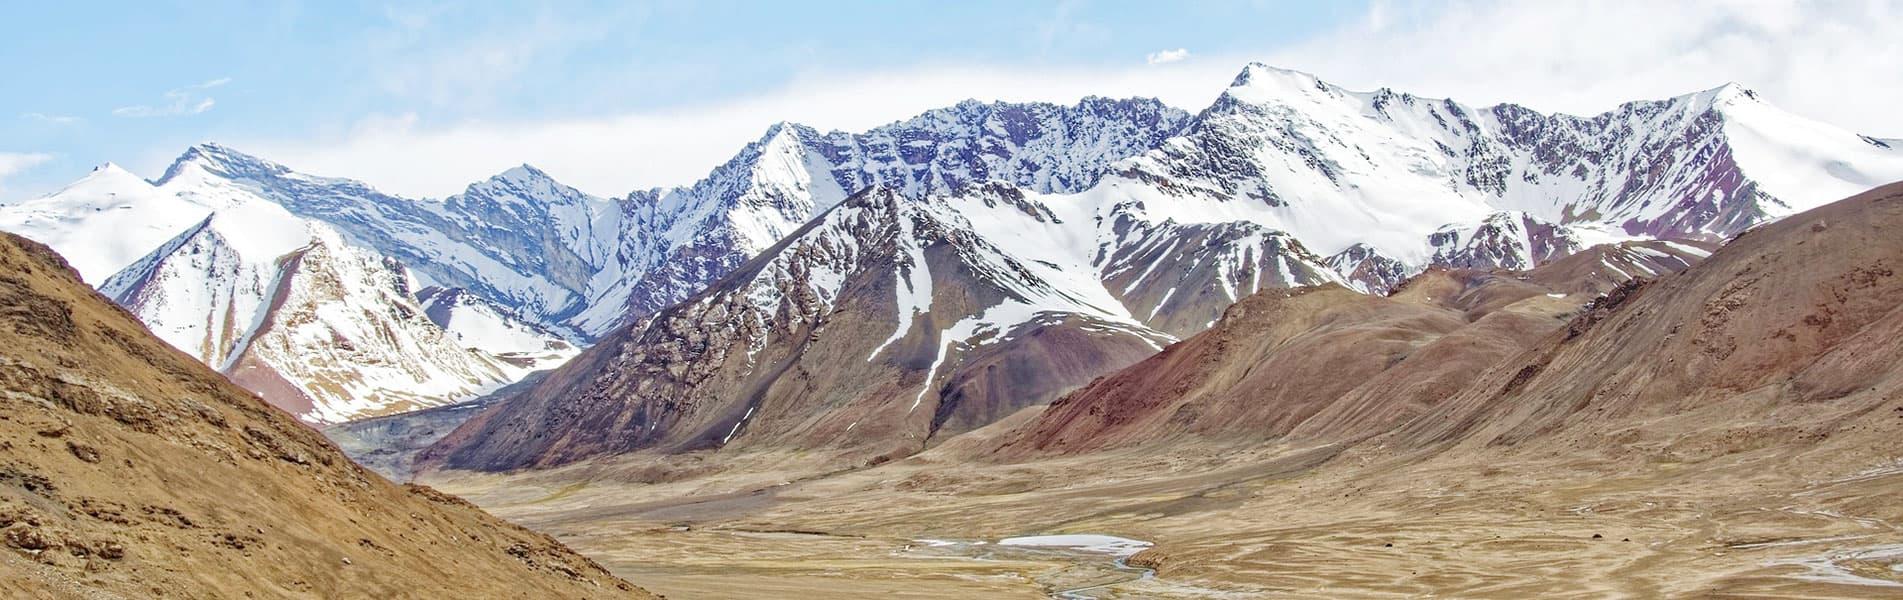 Tajikistan Pamir Plateau